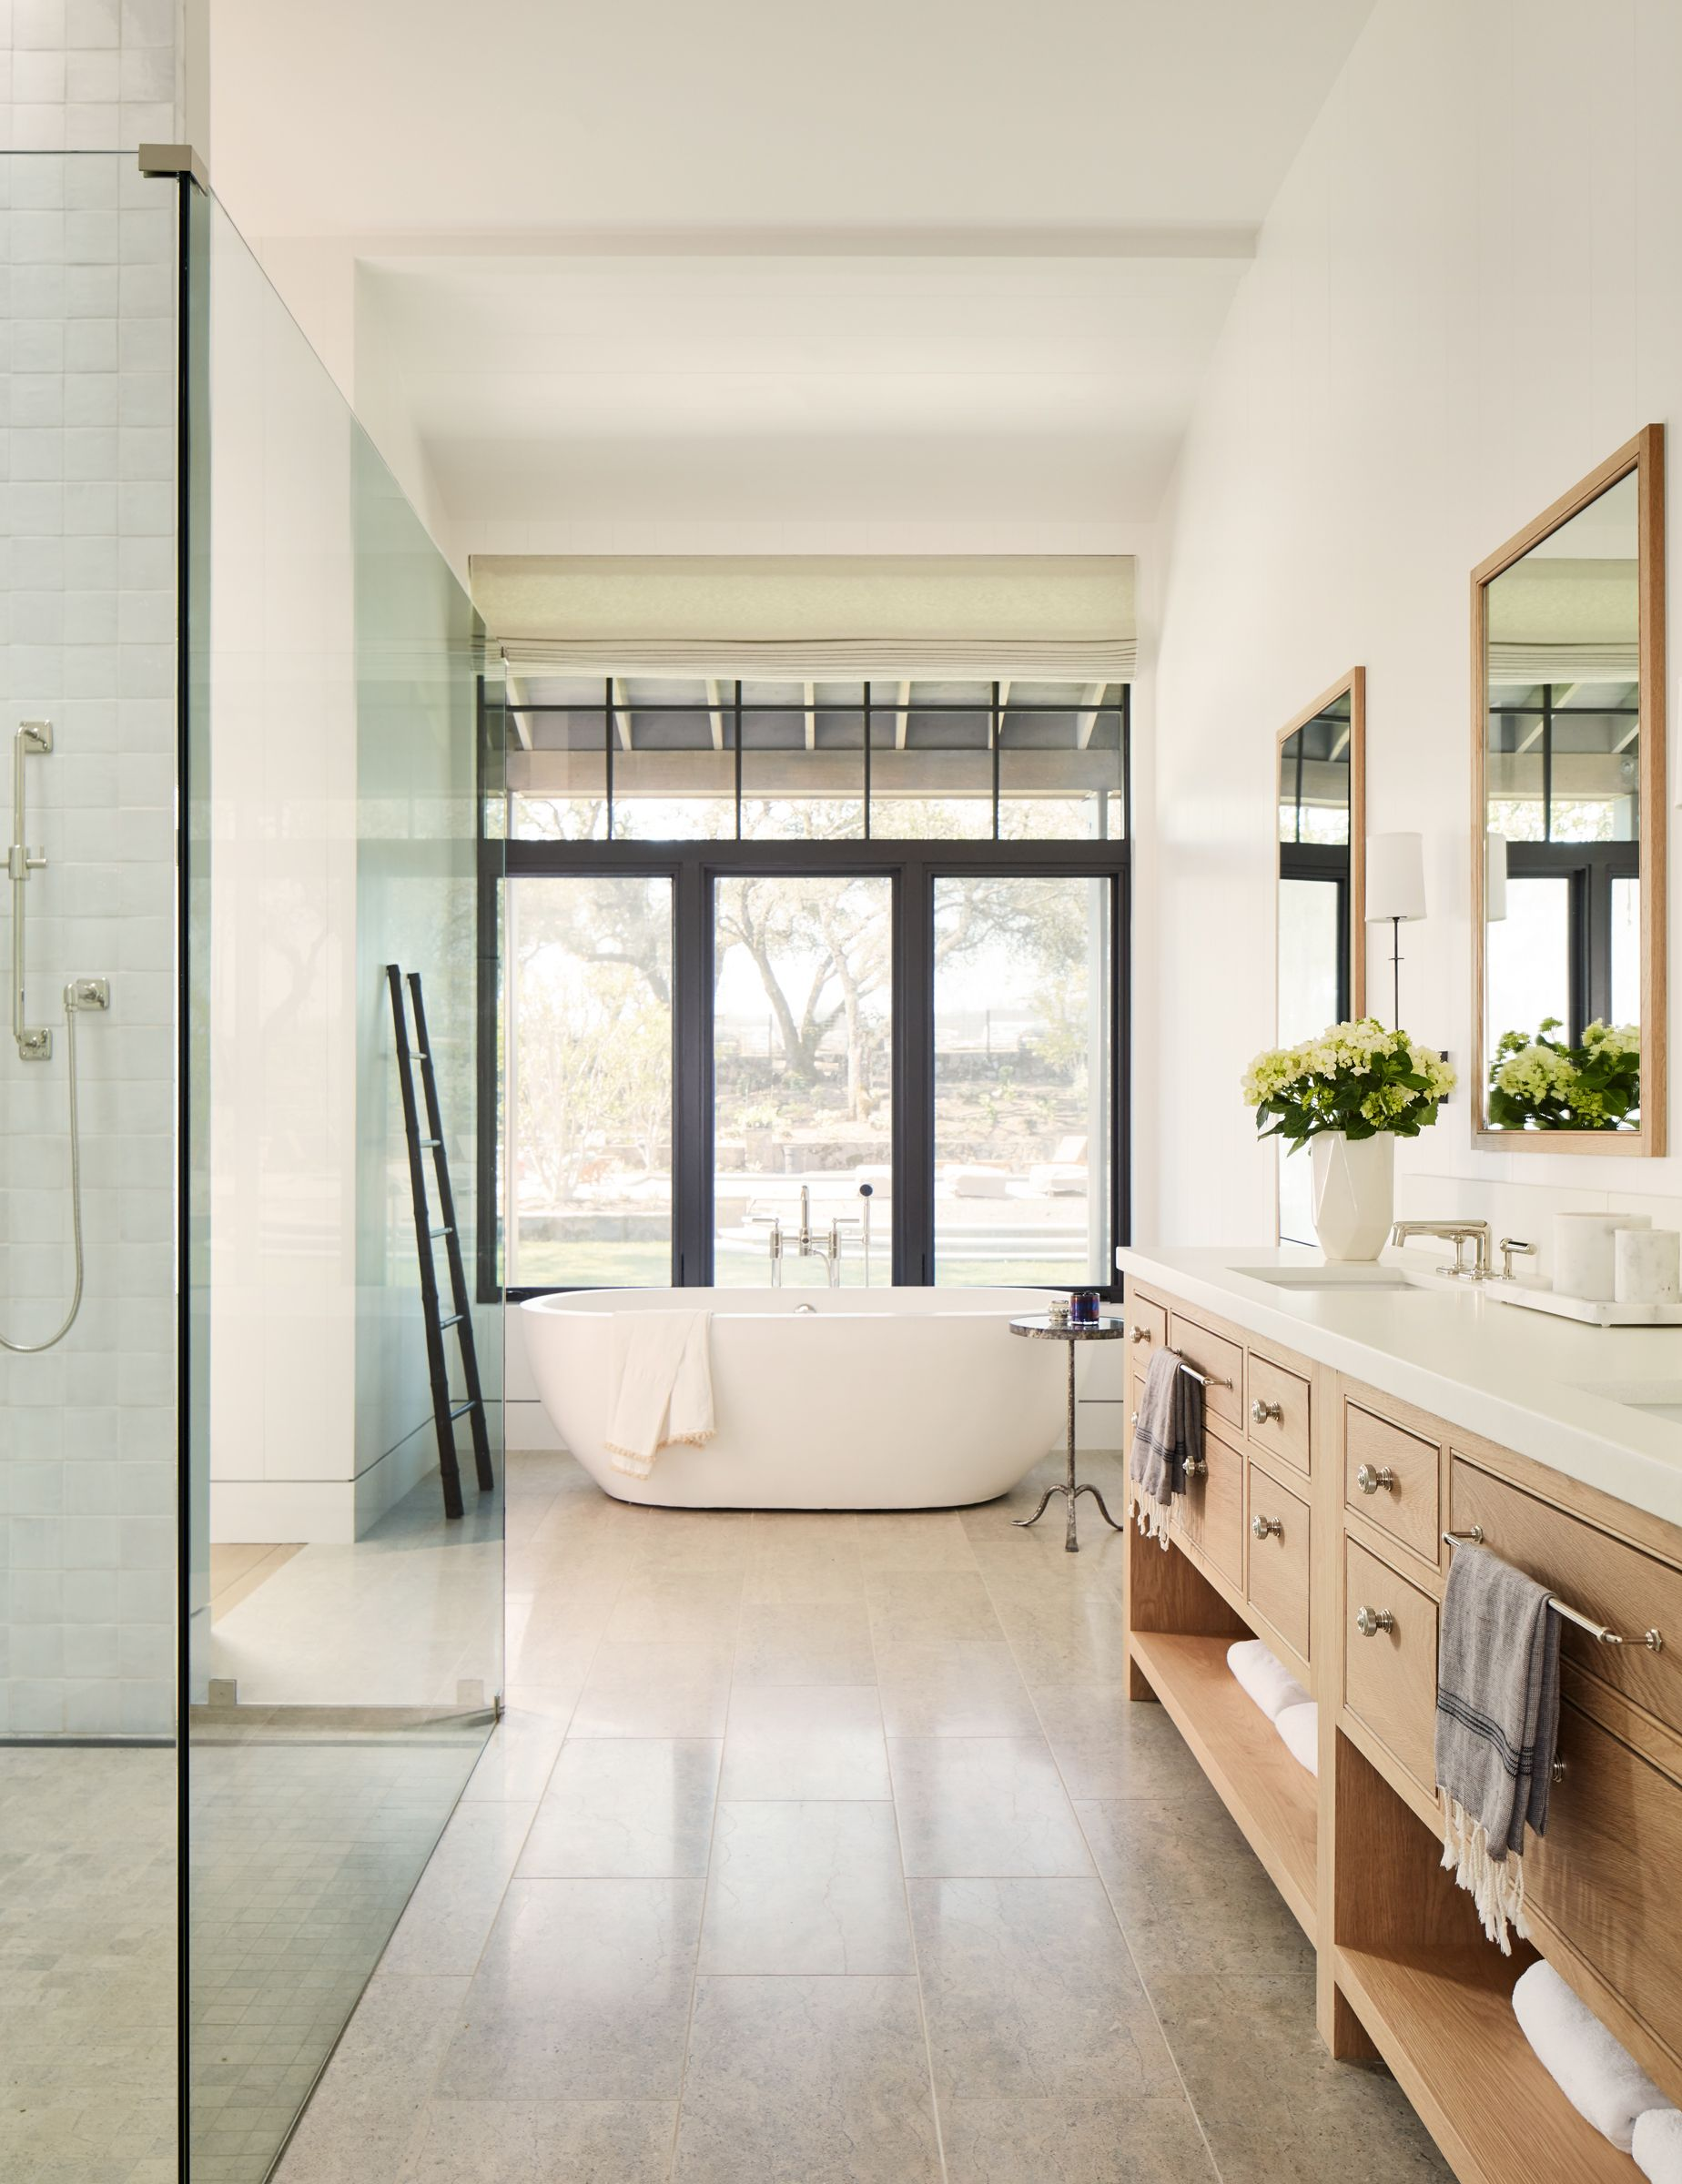 Luxury Bathroom Ideas With Modern Design, Elegant Master Bathrooms